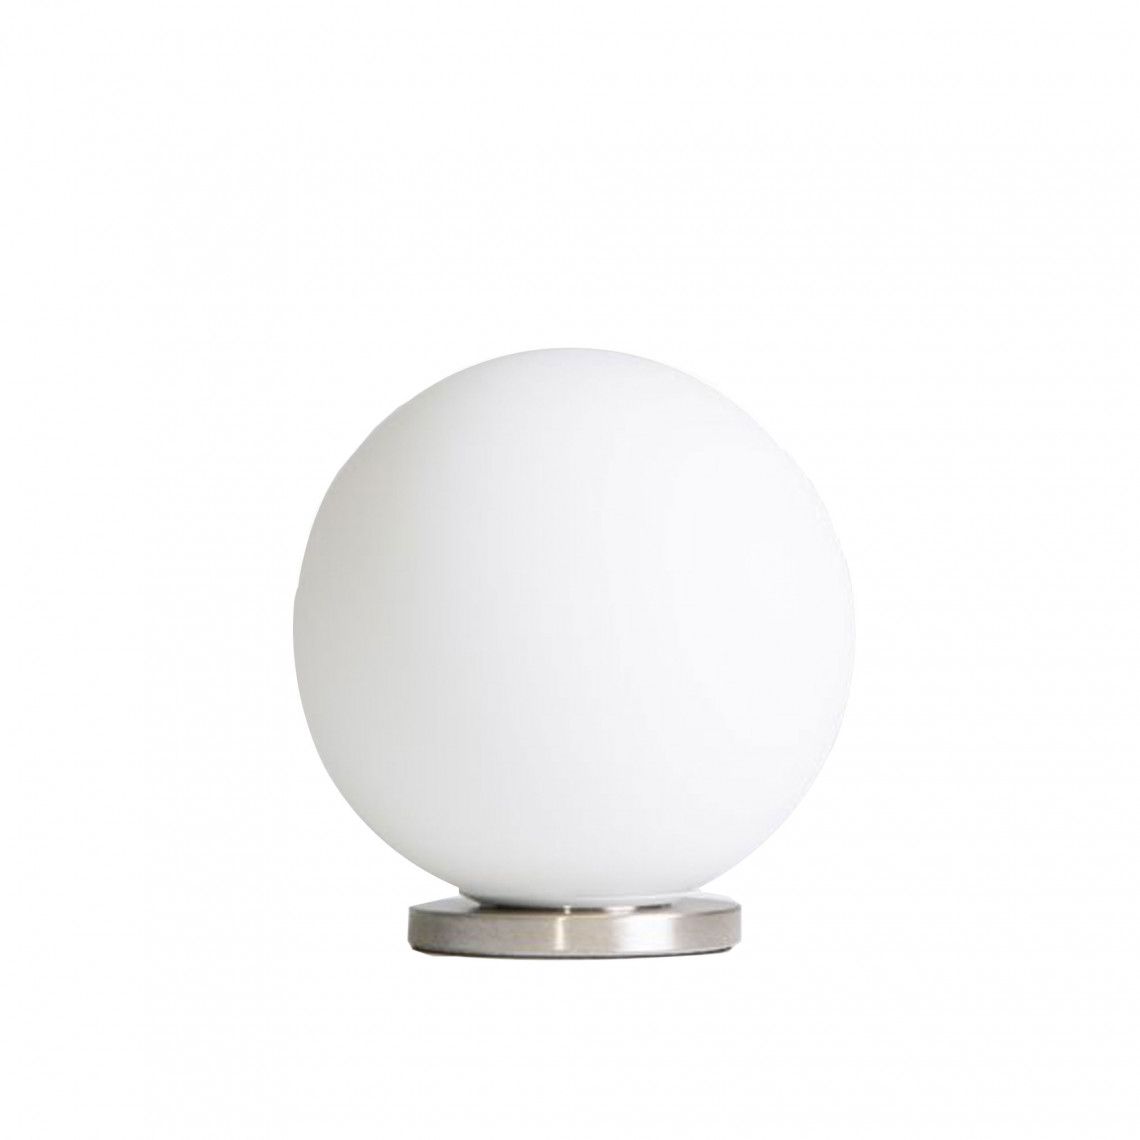 Pallina Nickel - Bordslampa